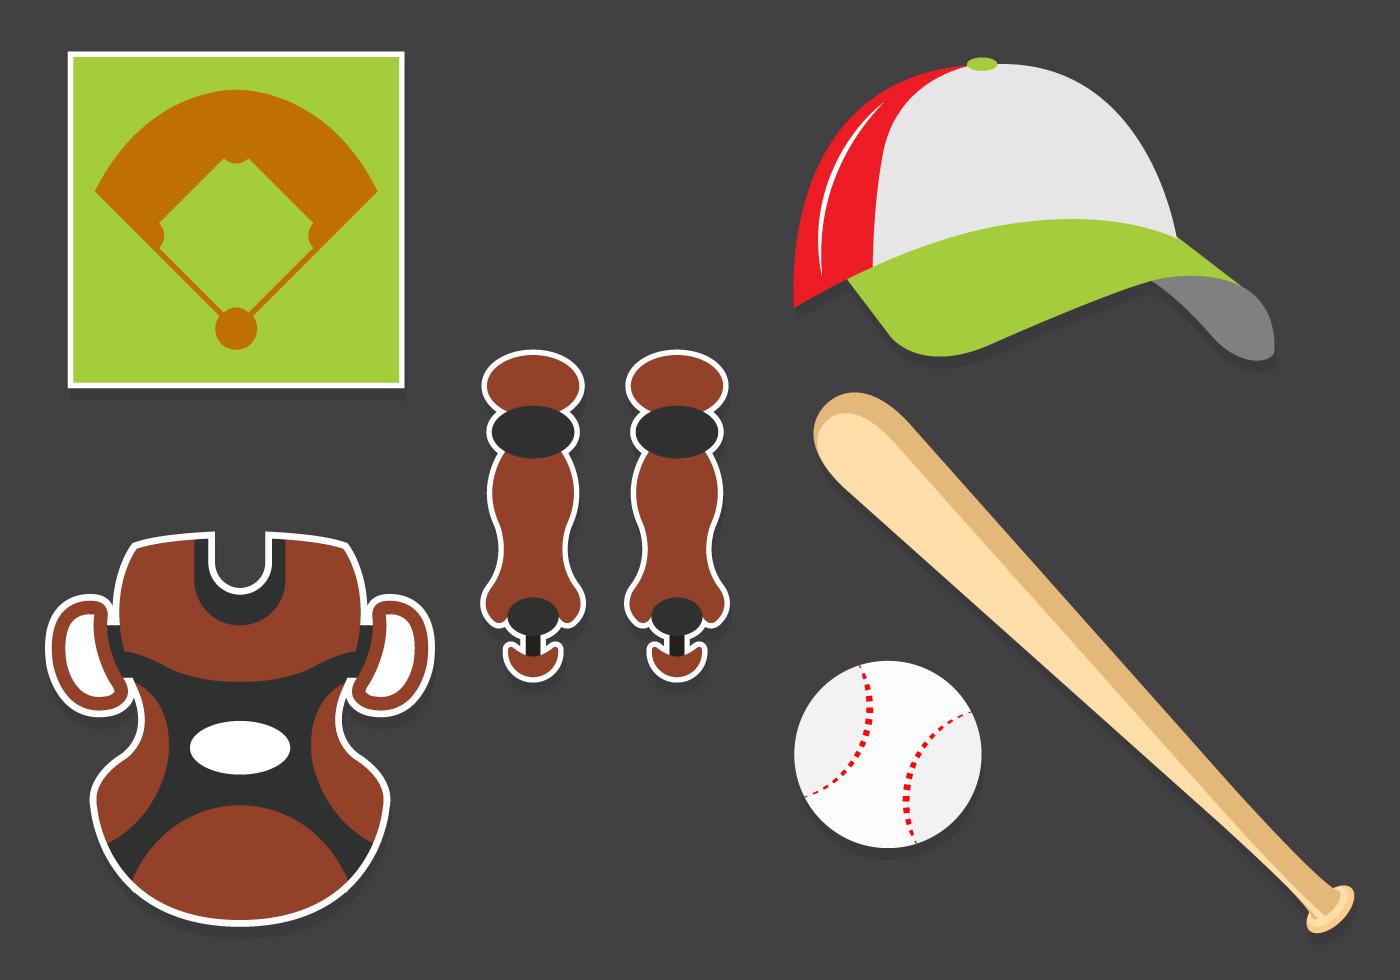 Vector Set Of Baseball Symbols Download Free Vector Art